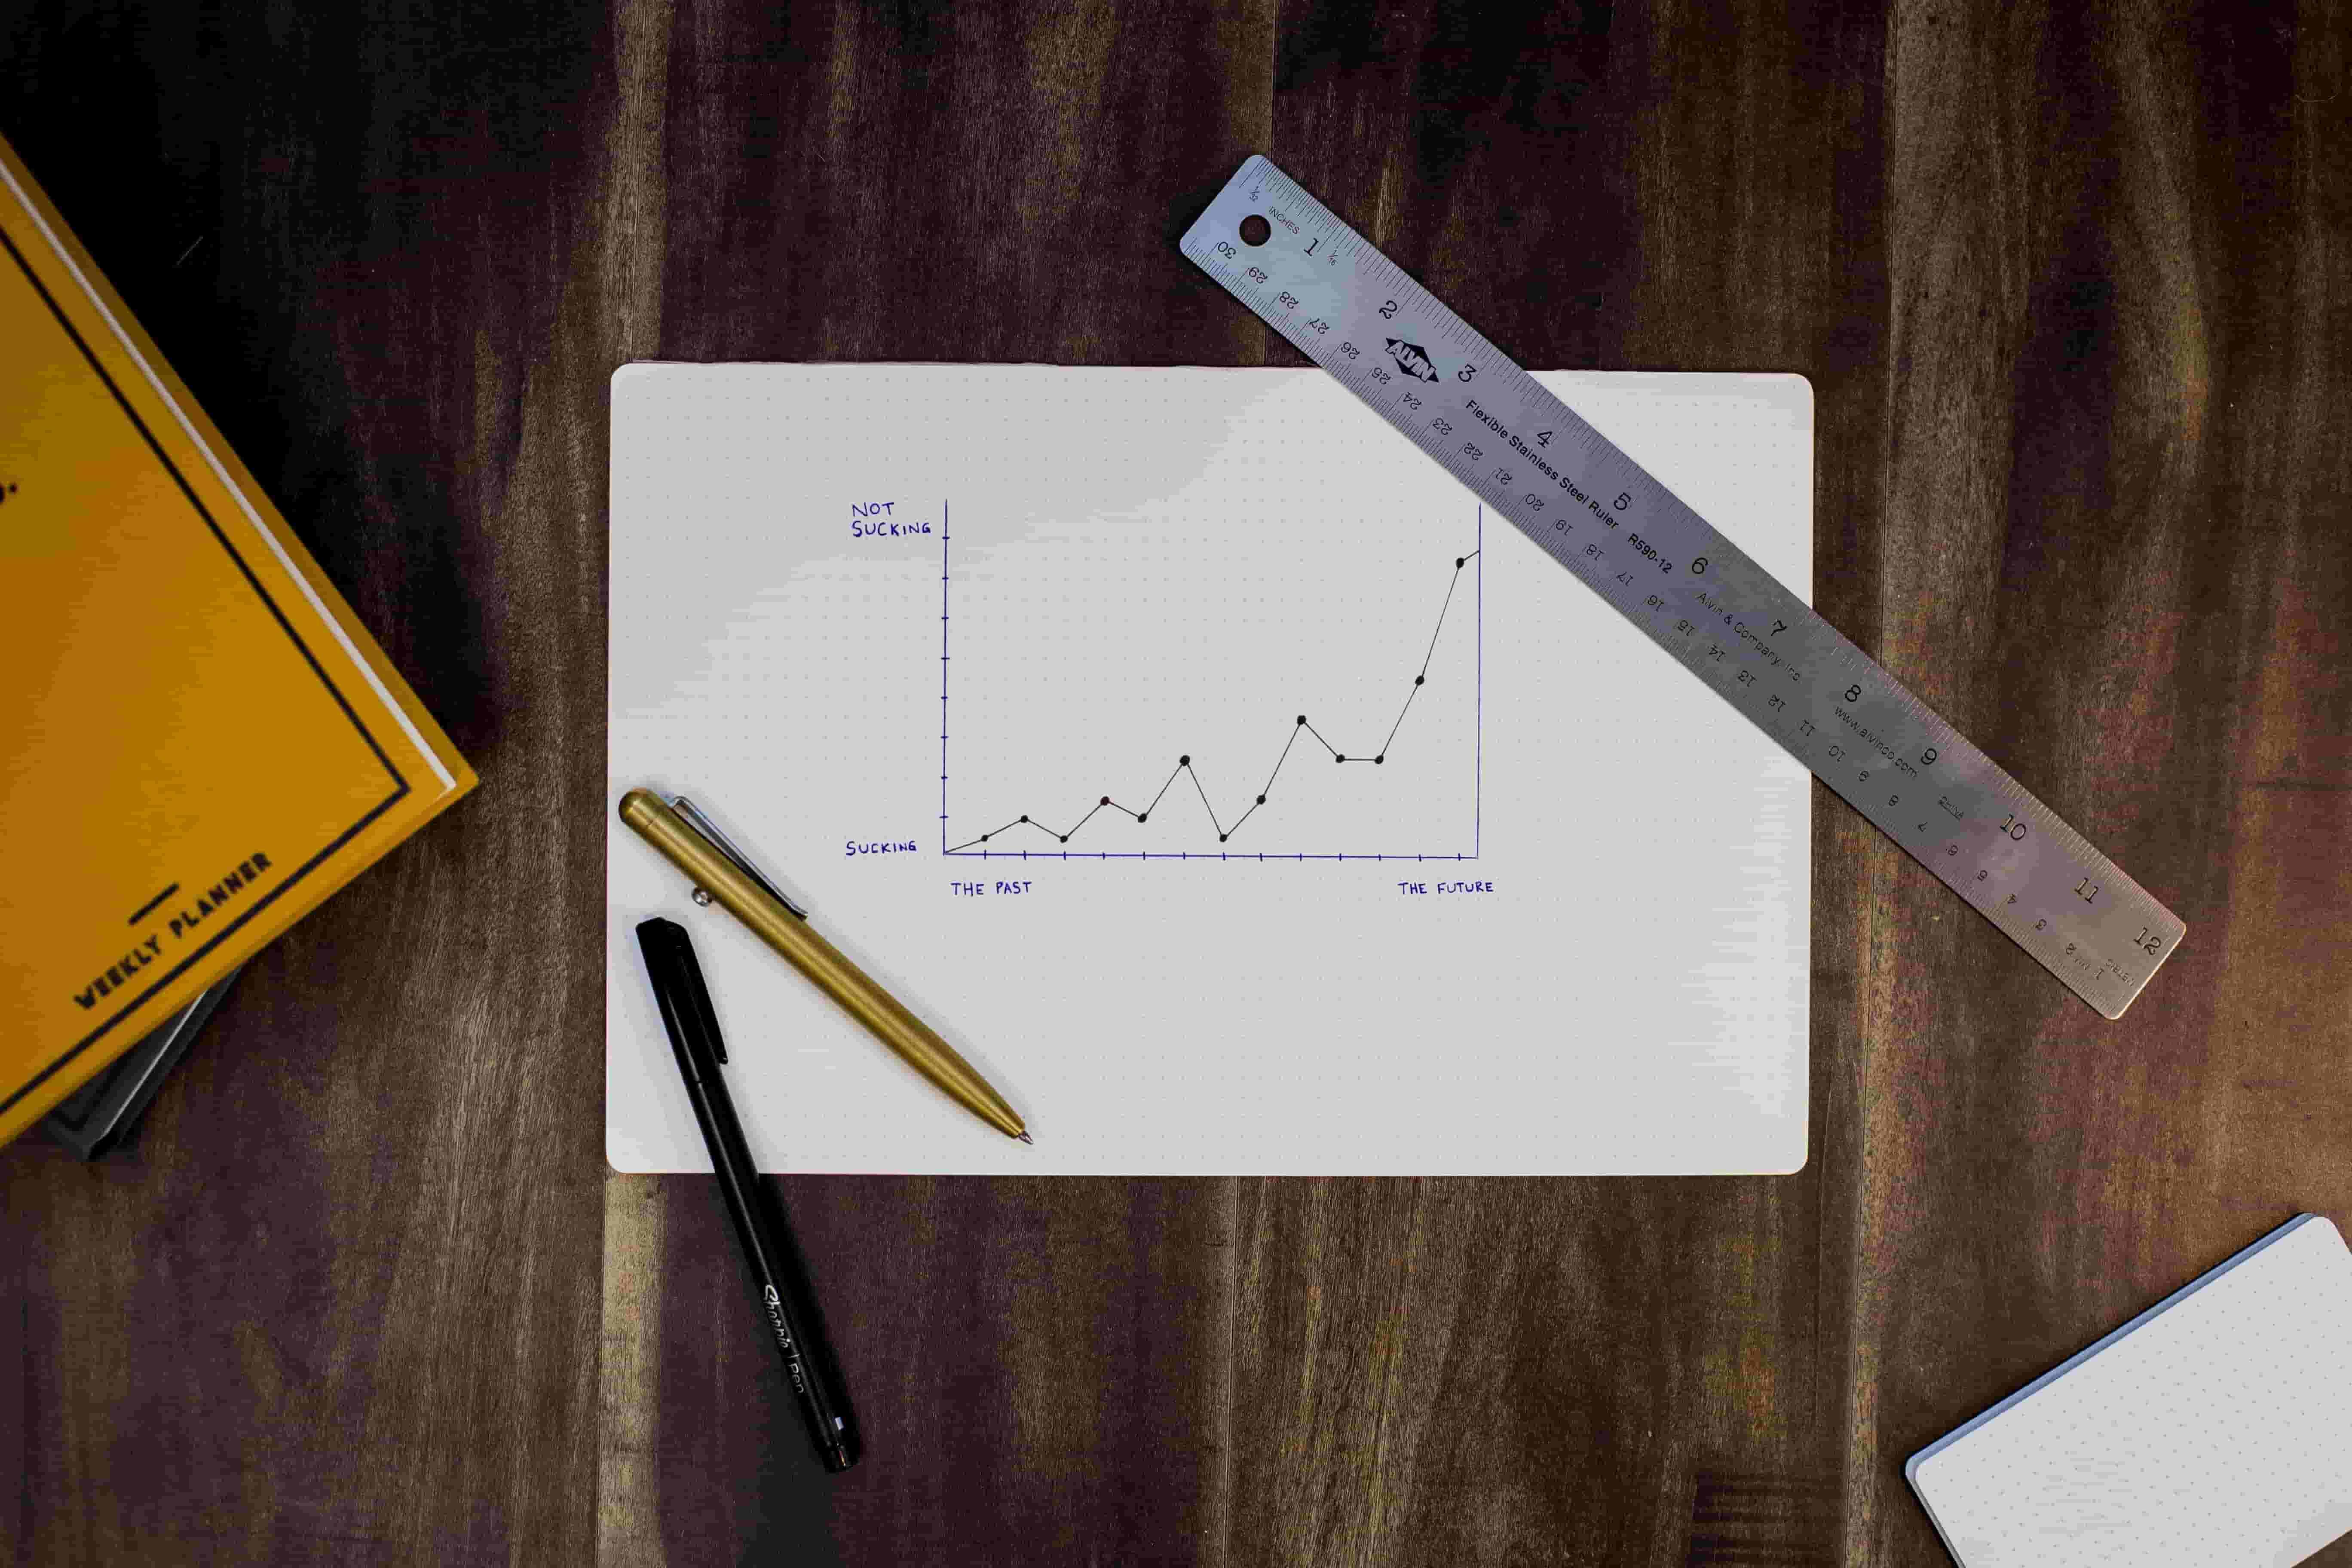 Calderdale SME Business Growth